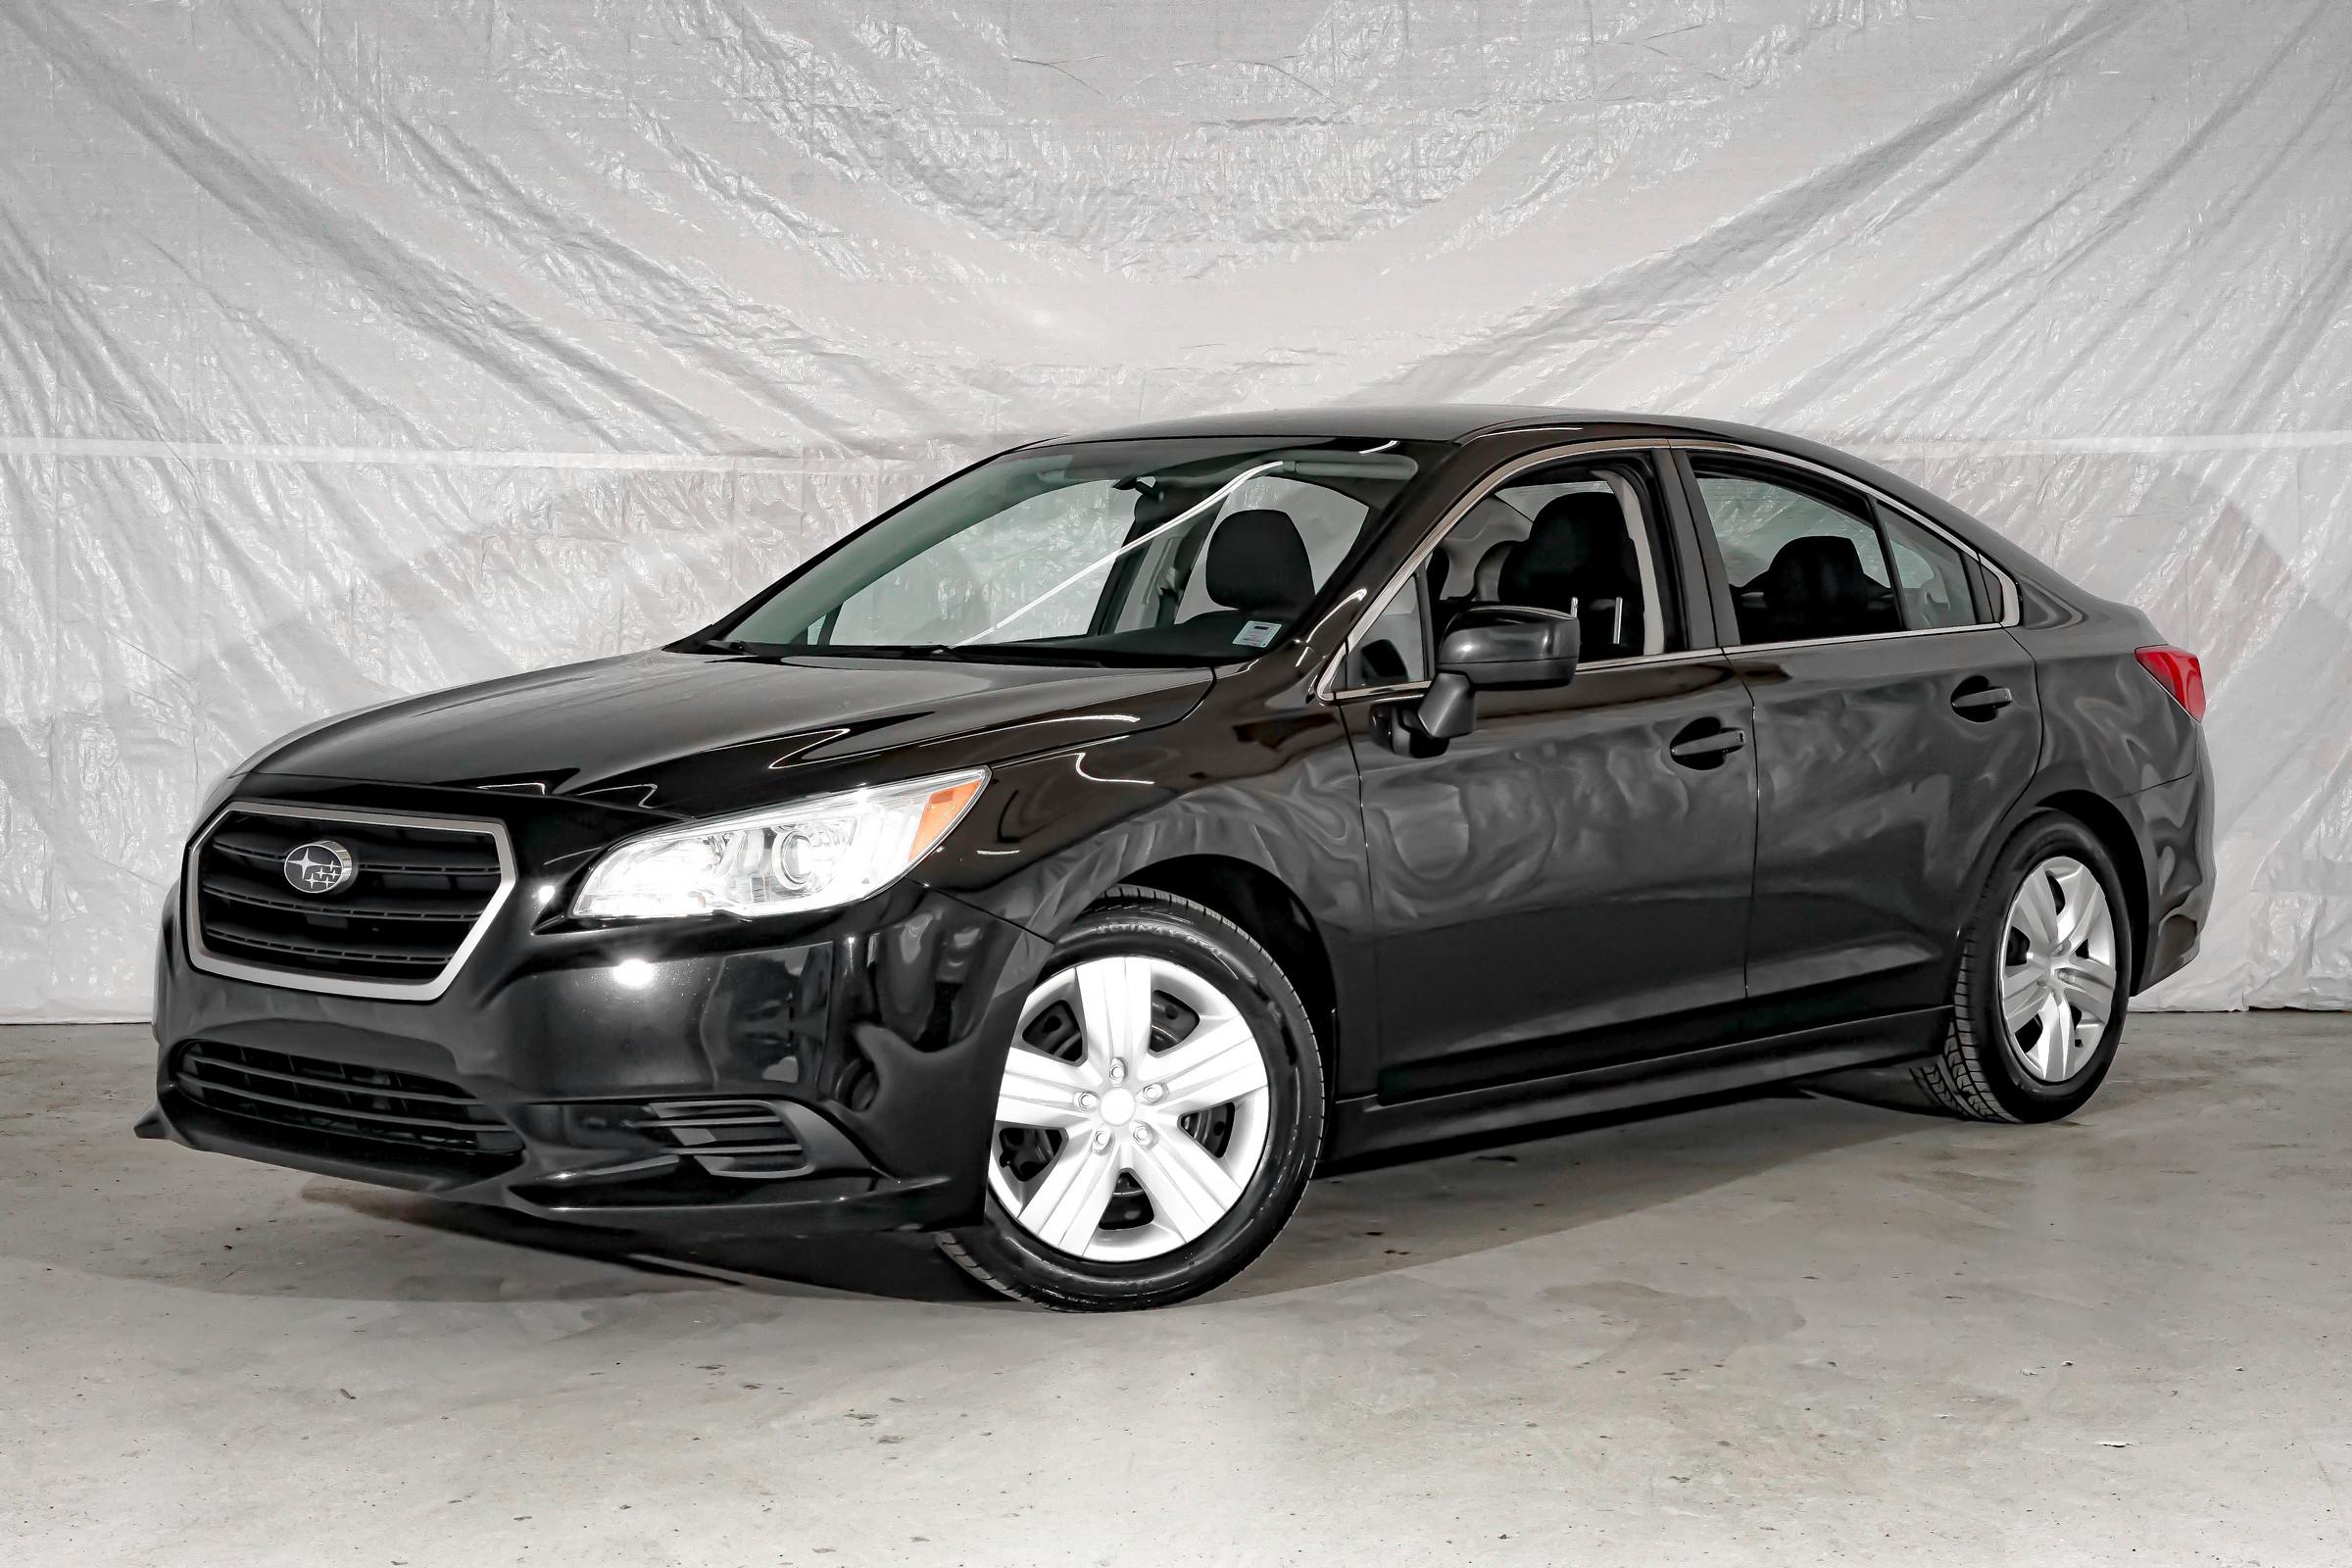 Black Subaru Legacy 2.5i